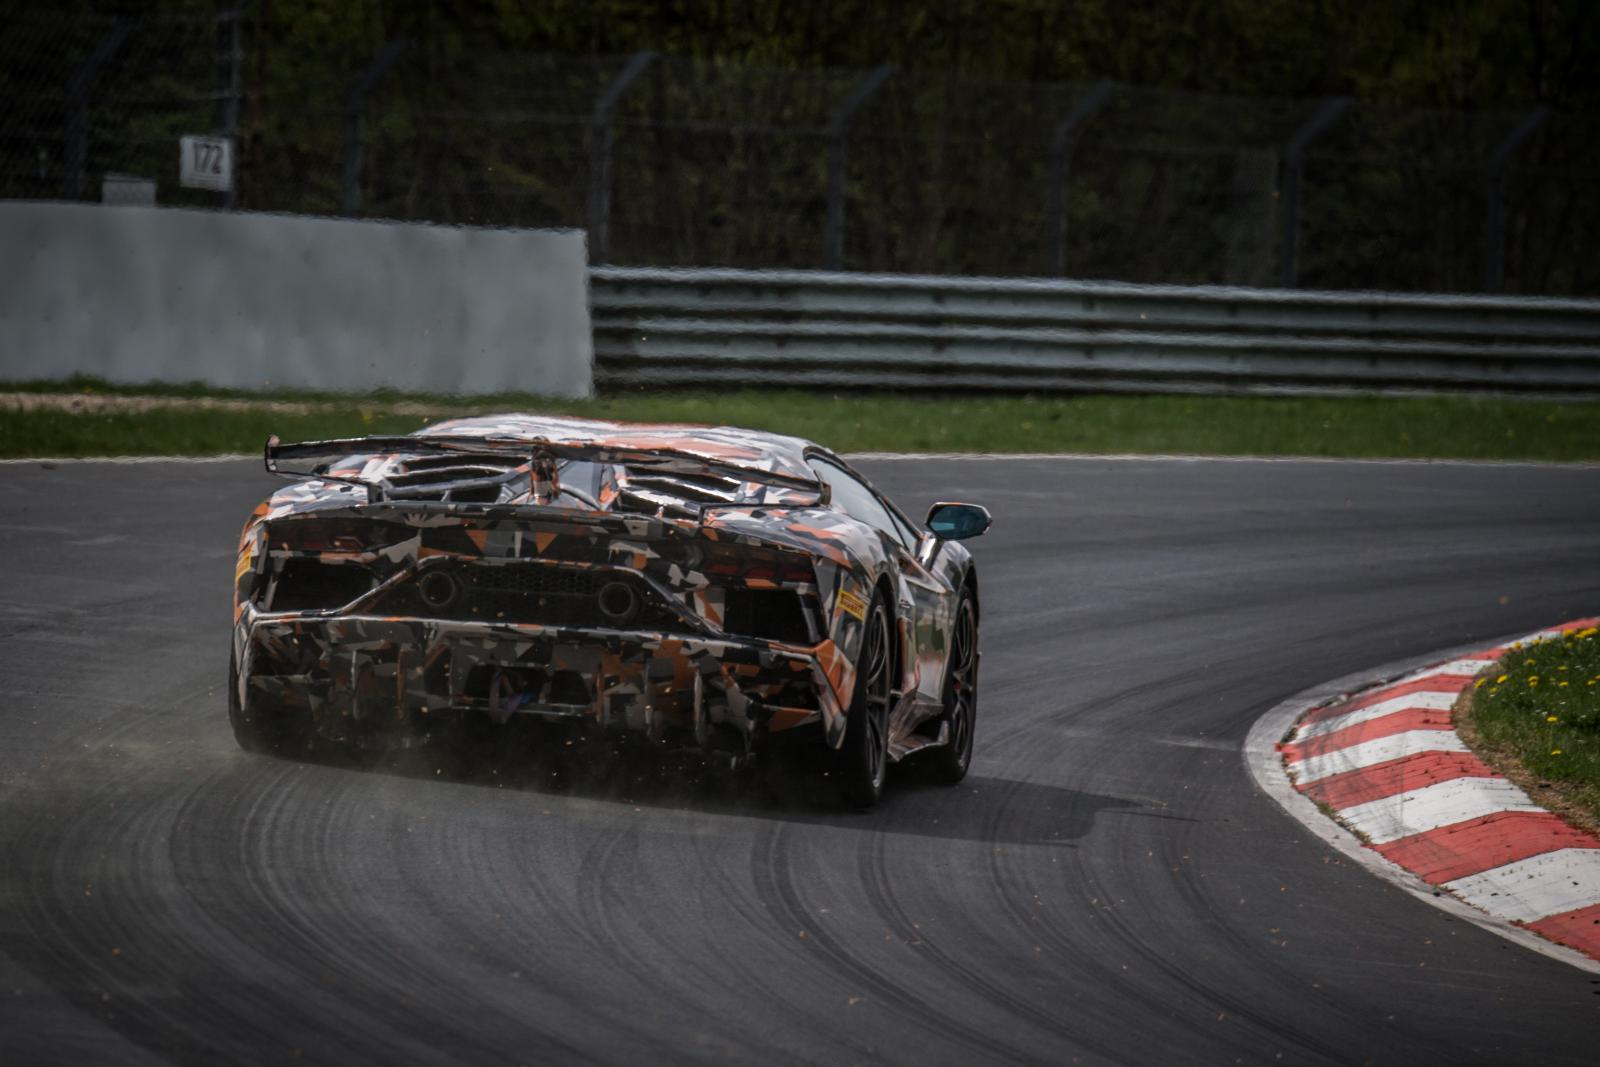 Lamborghini slog Nürburgring-rekord